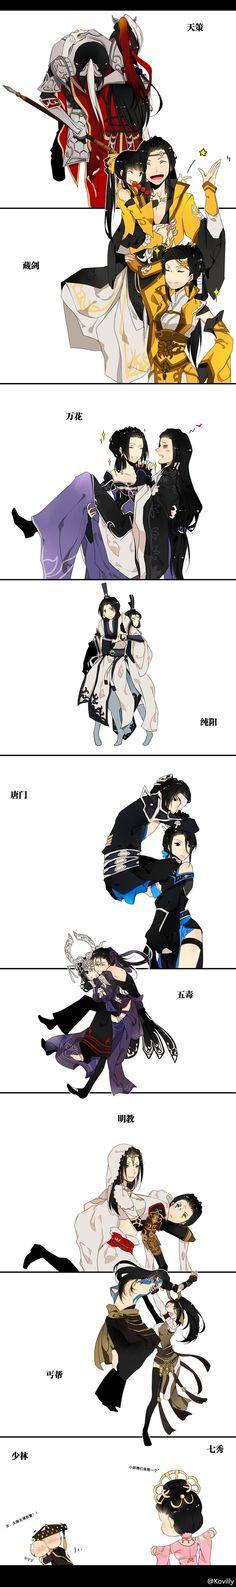 What a cute portrait of heroines hugging the heroes in JX3!!! Love it!